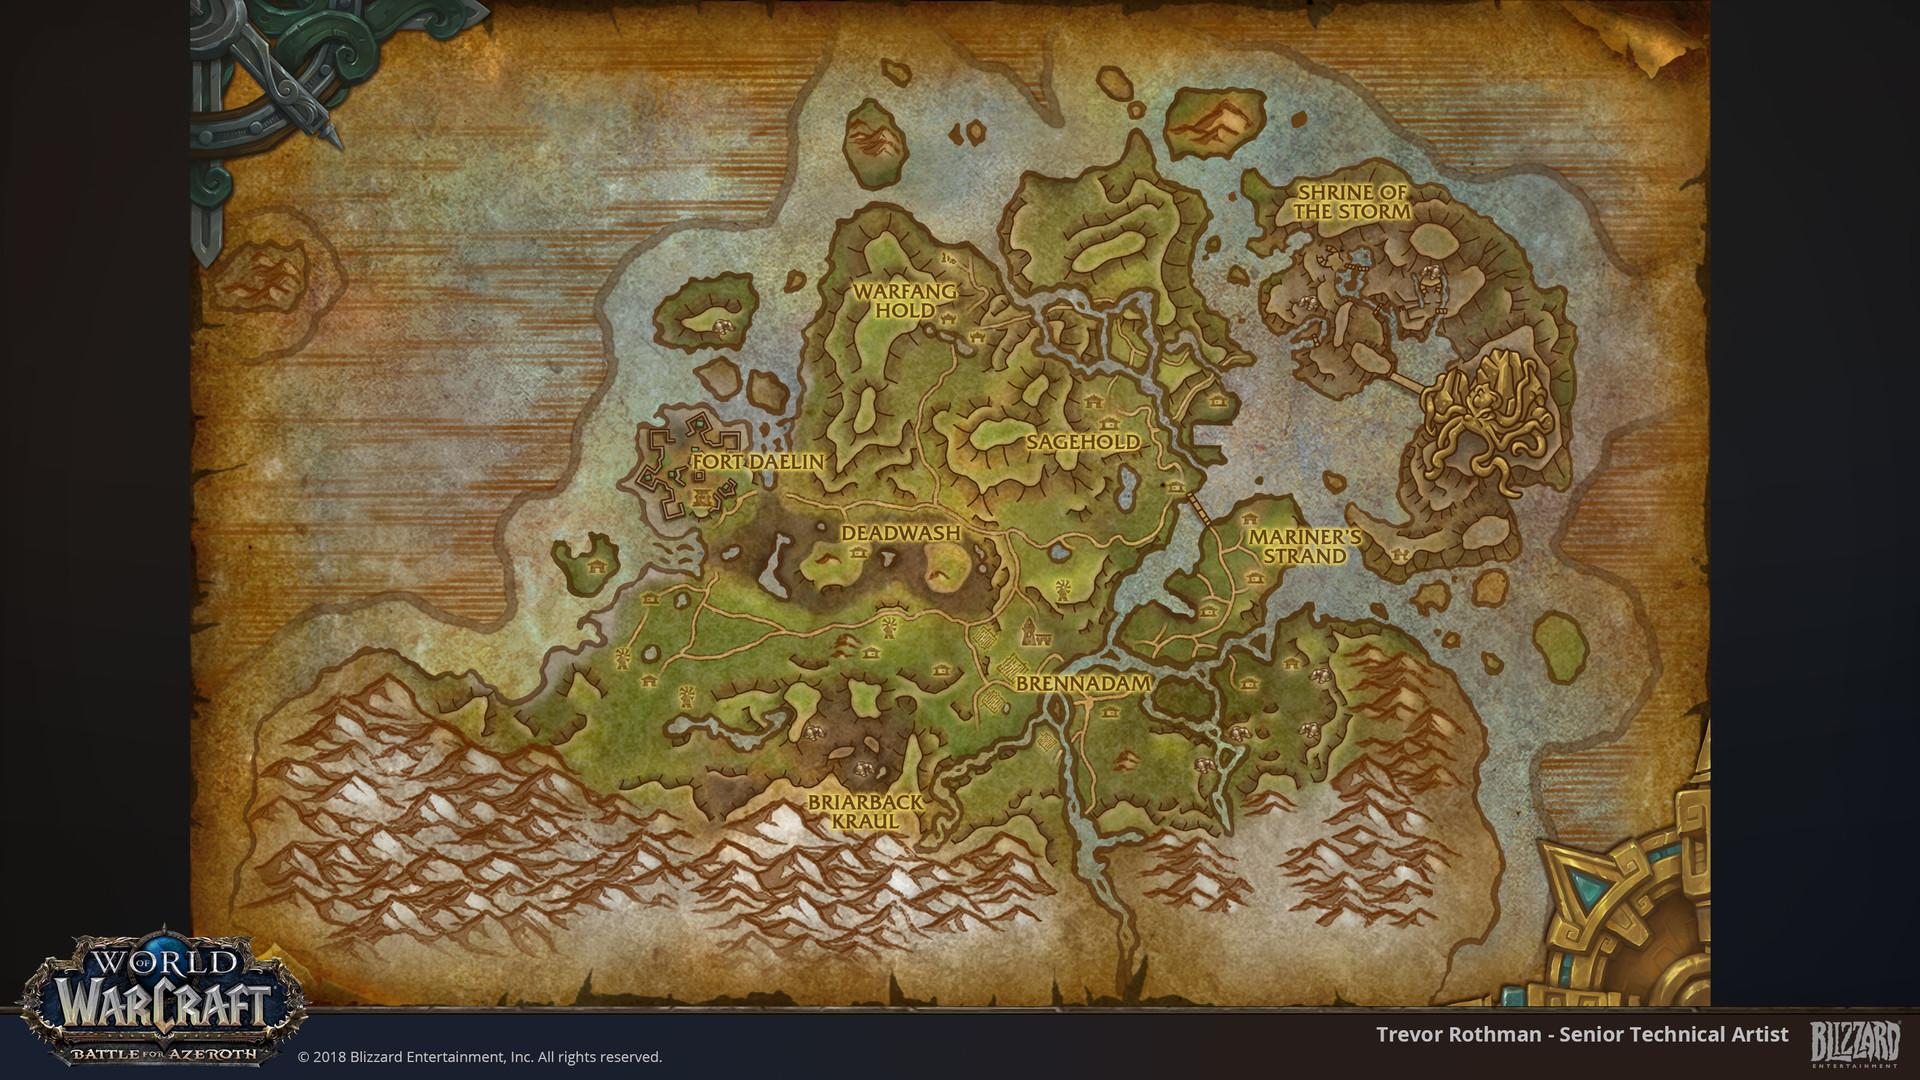 World Of Warcraft World Map ArtStation   World of Warcraft: Battle for Azeroth Maps, Trevor